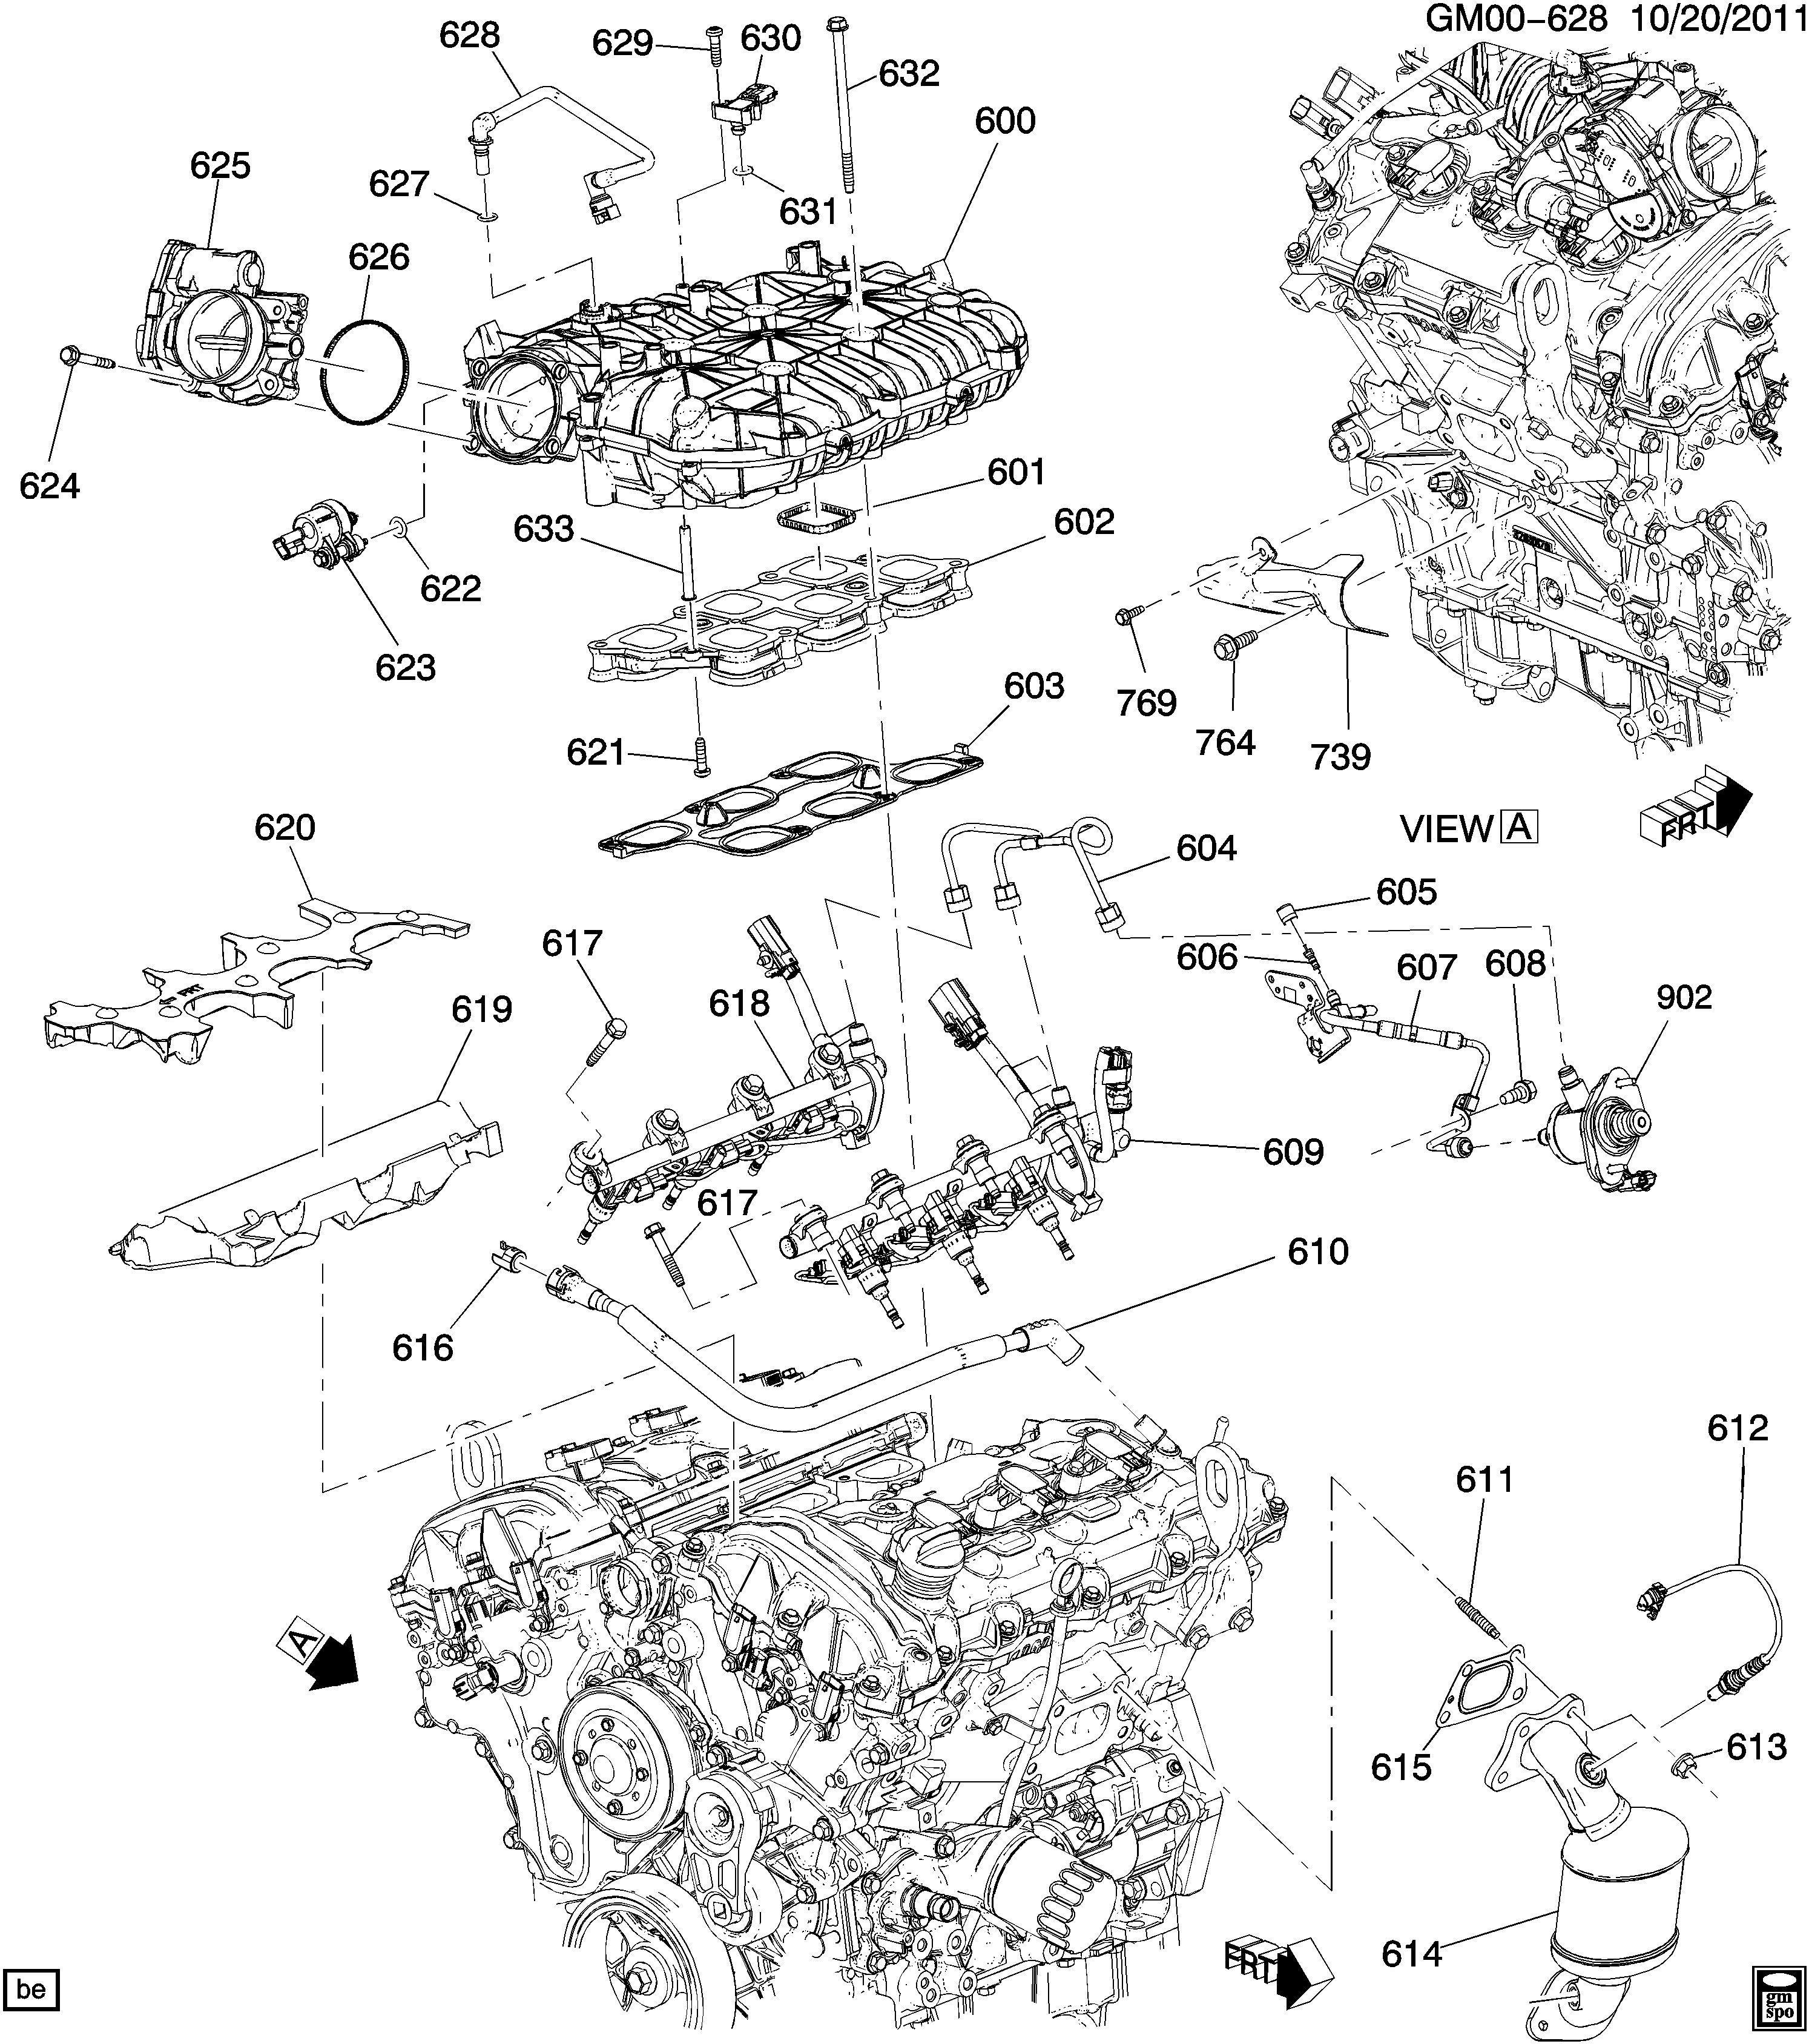 Cadillac Srx Stud Catalytic Converter Exhaust Muffler